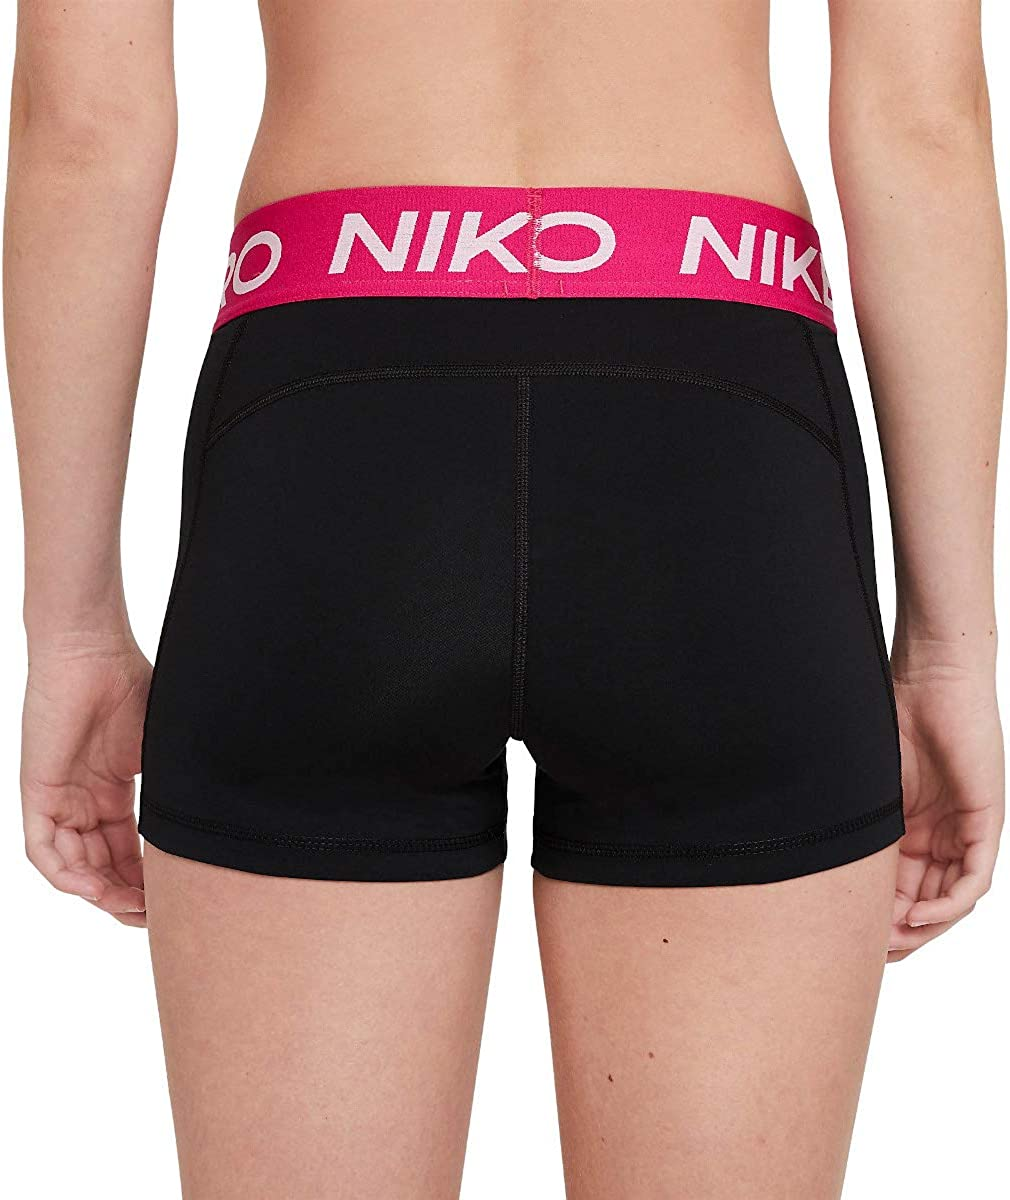 Nike Womens Pro 365 3 Shorts